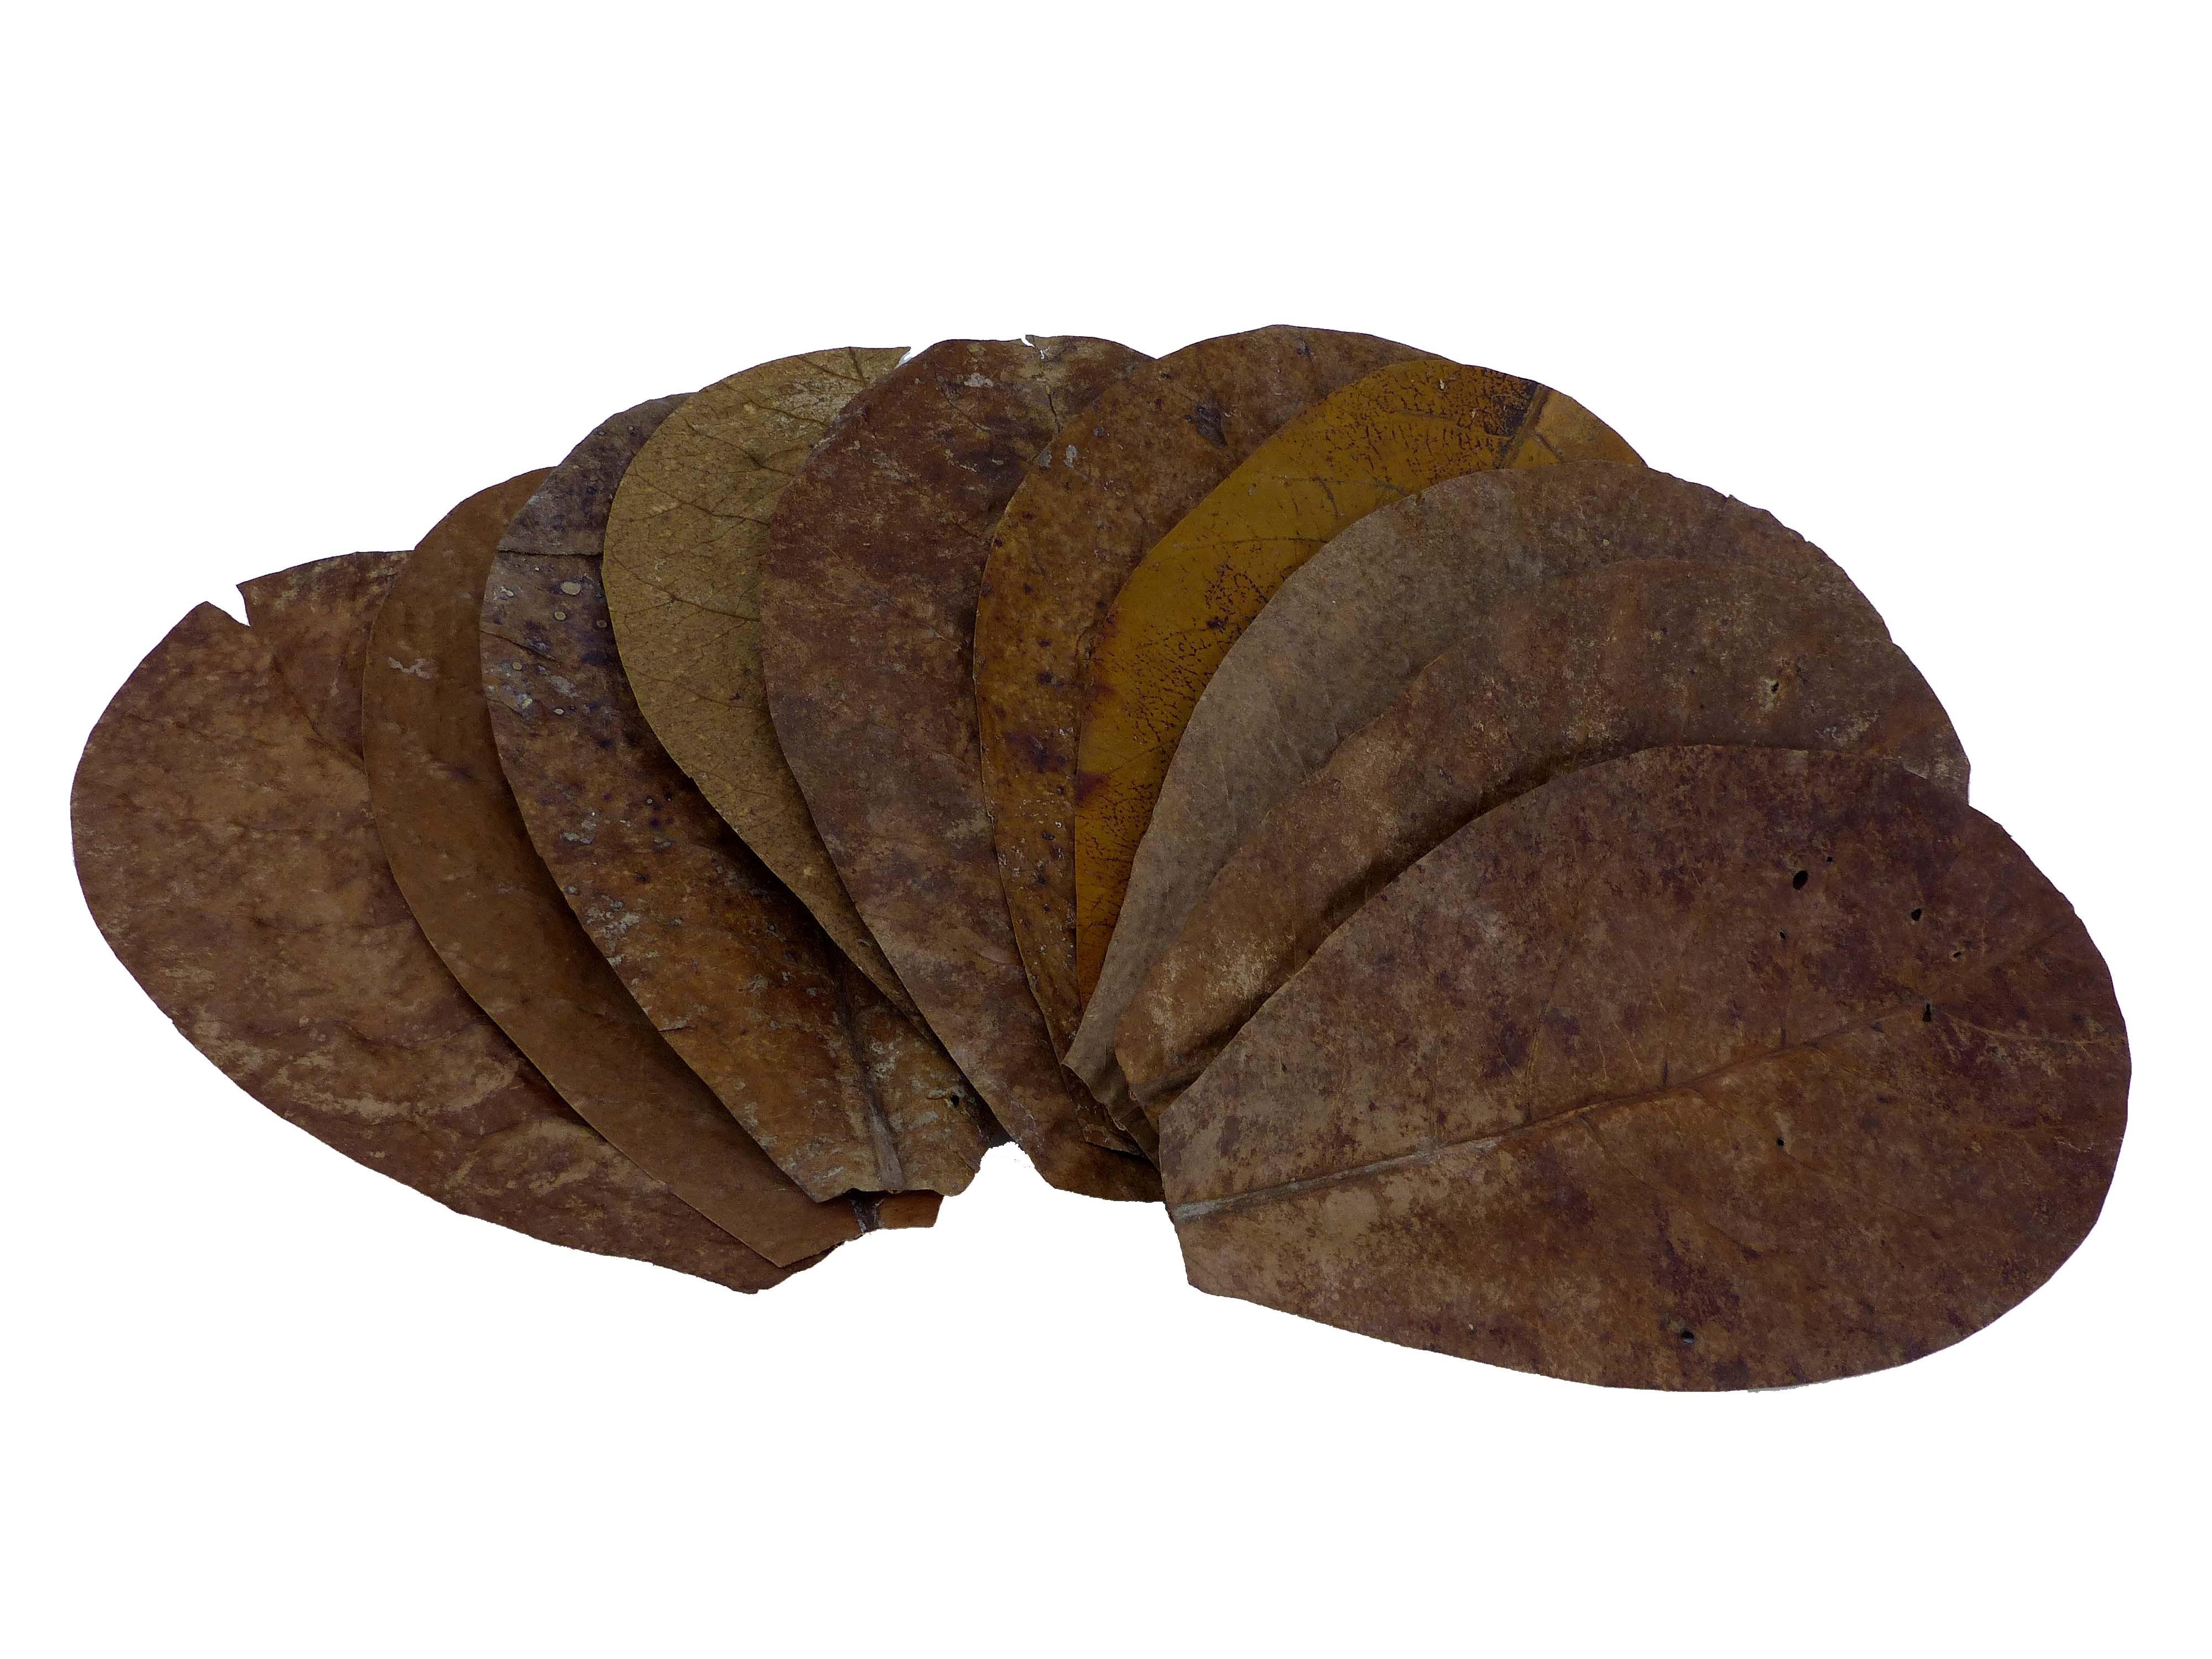 Catappa Blätter - Seemandelbaum - M 16-20cm - 1